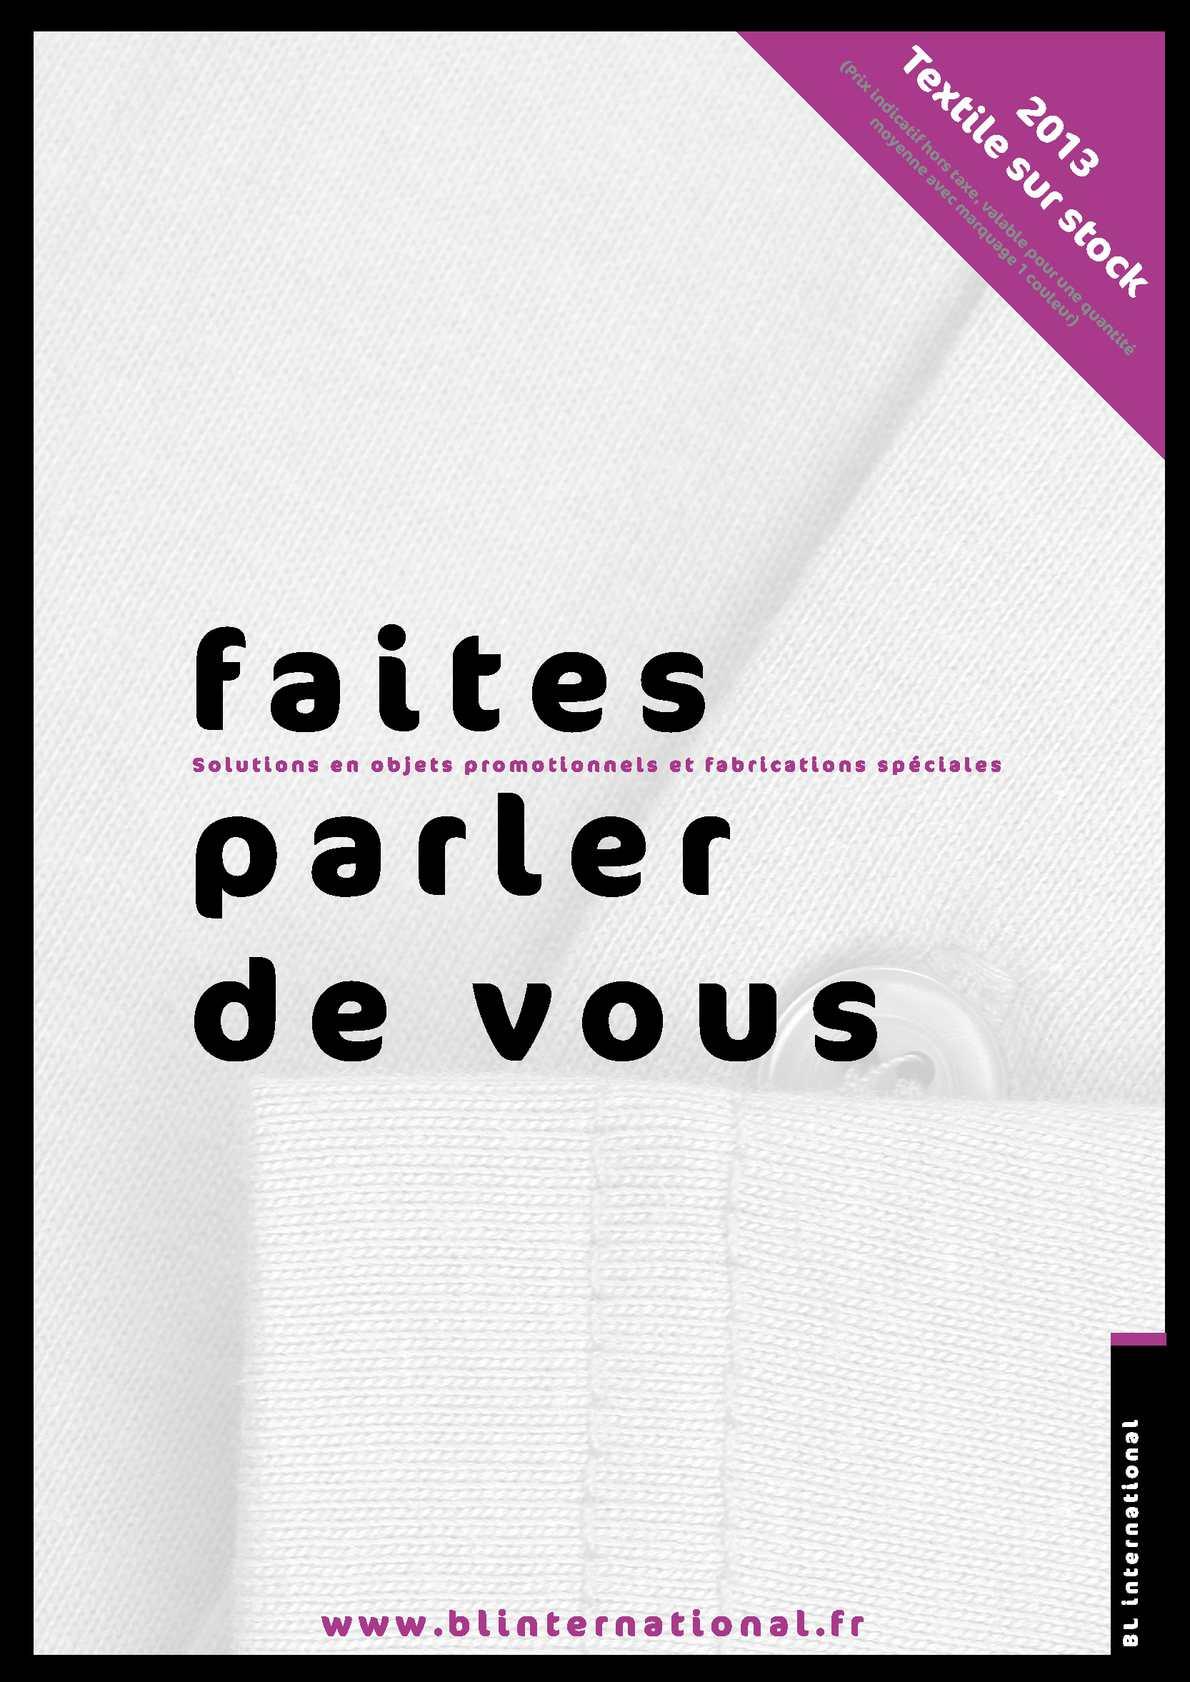 Calaméo - Catalogue textile partie 2 BL International 2013 3e98377a6dc